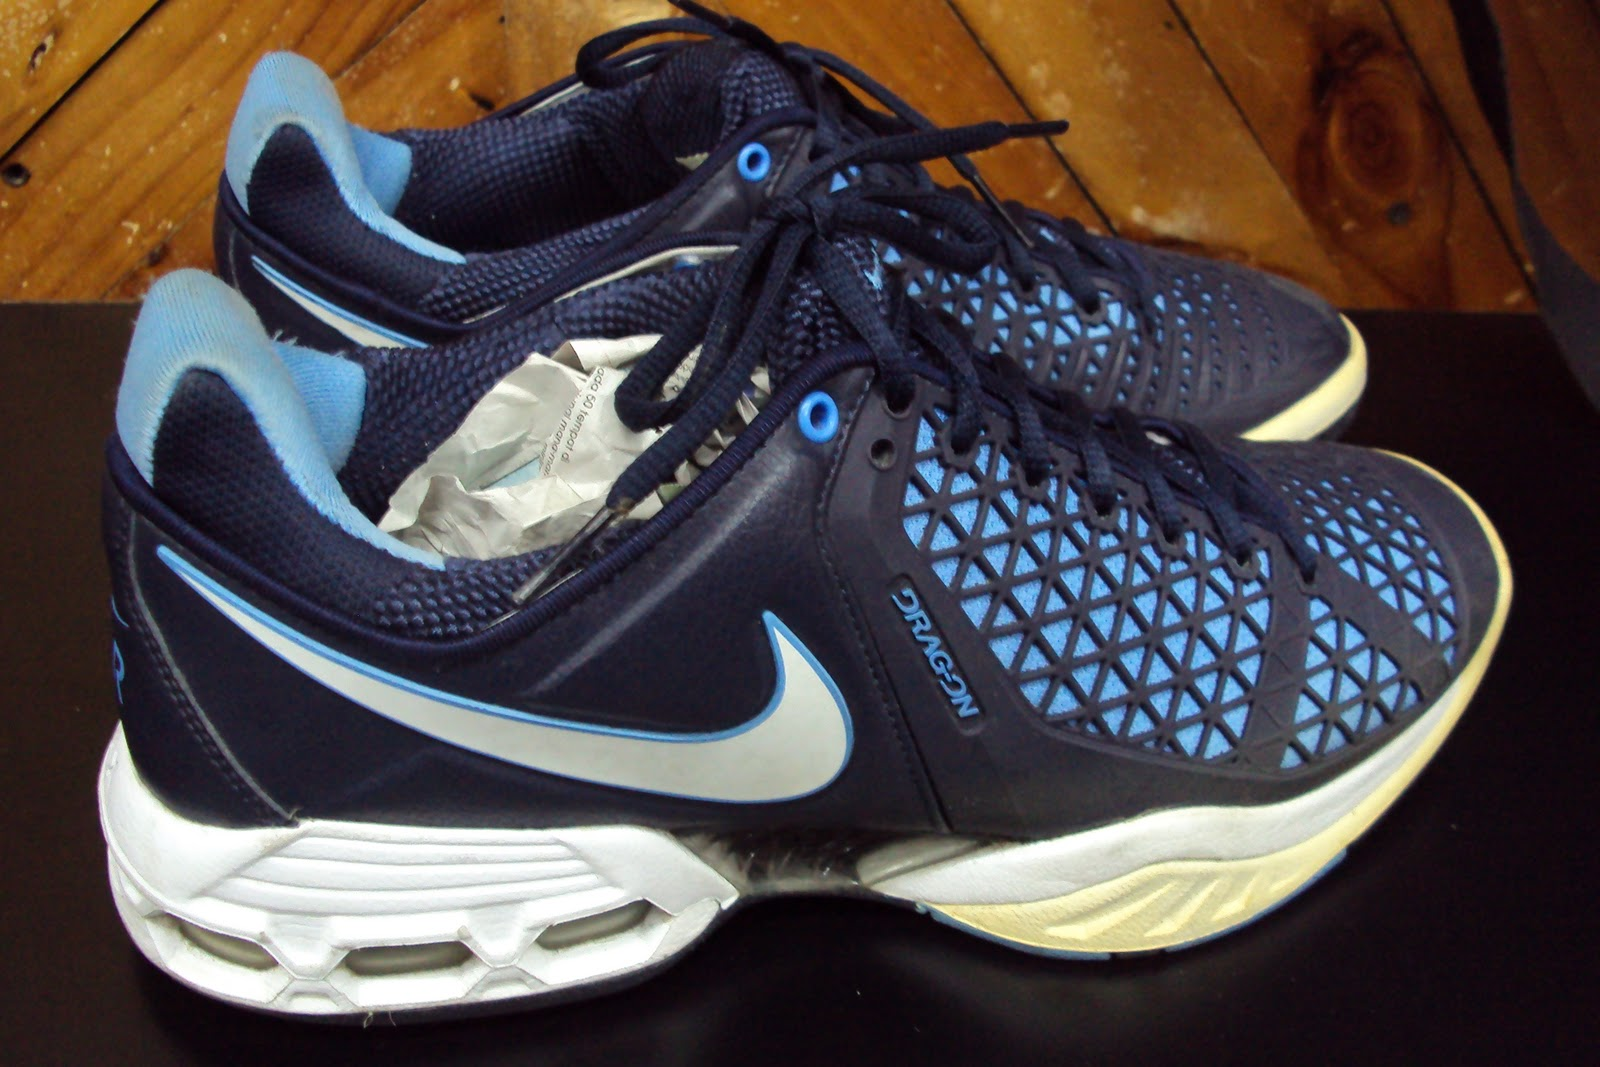 Barangan Baru Amp Terpakai Nike Dragon Tennis Shoe Sold